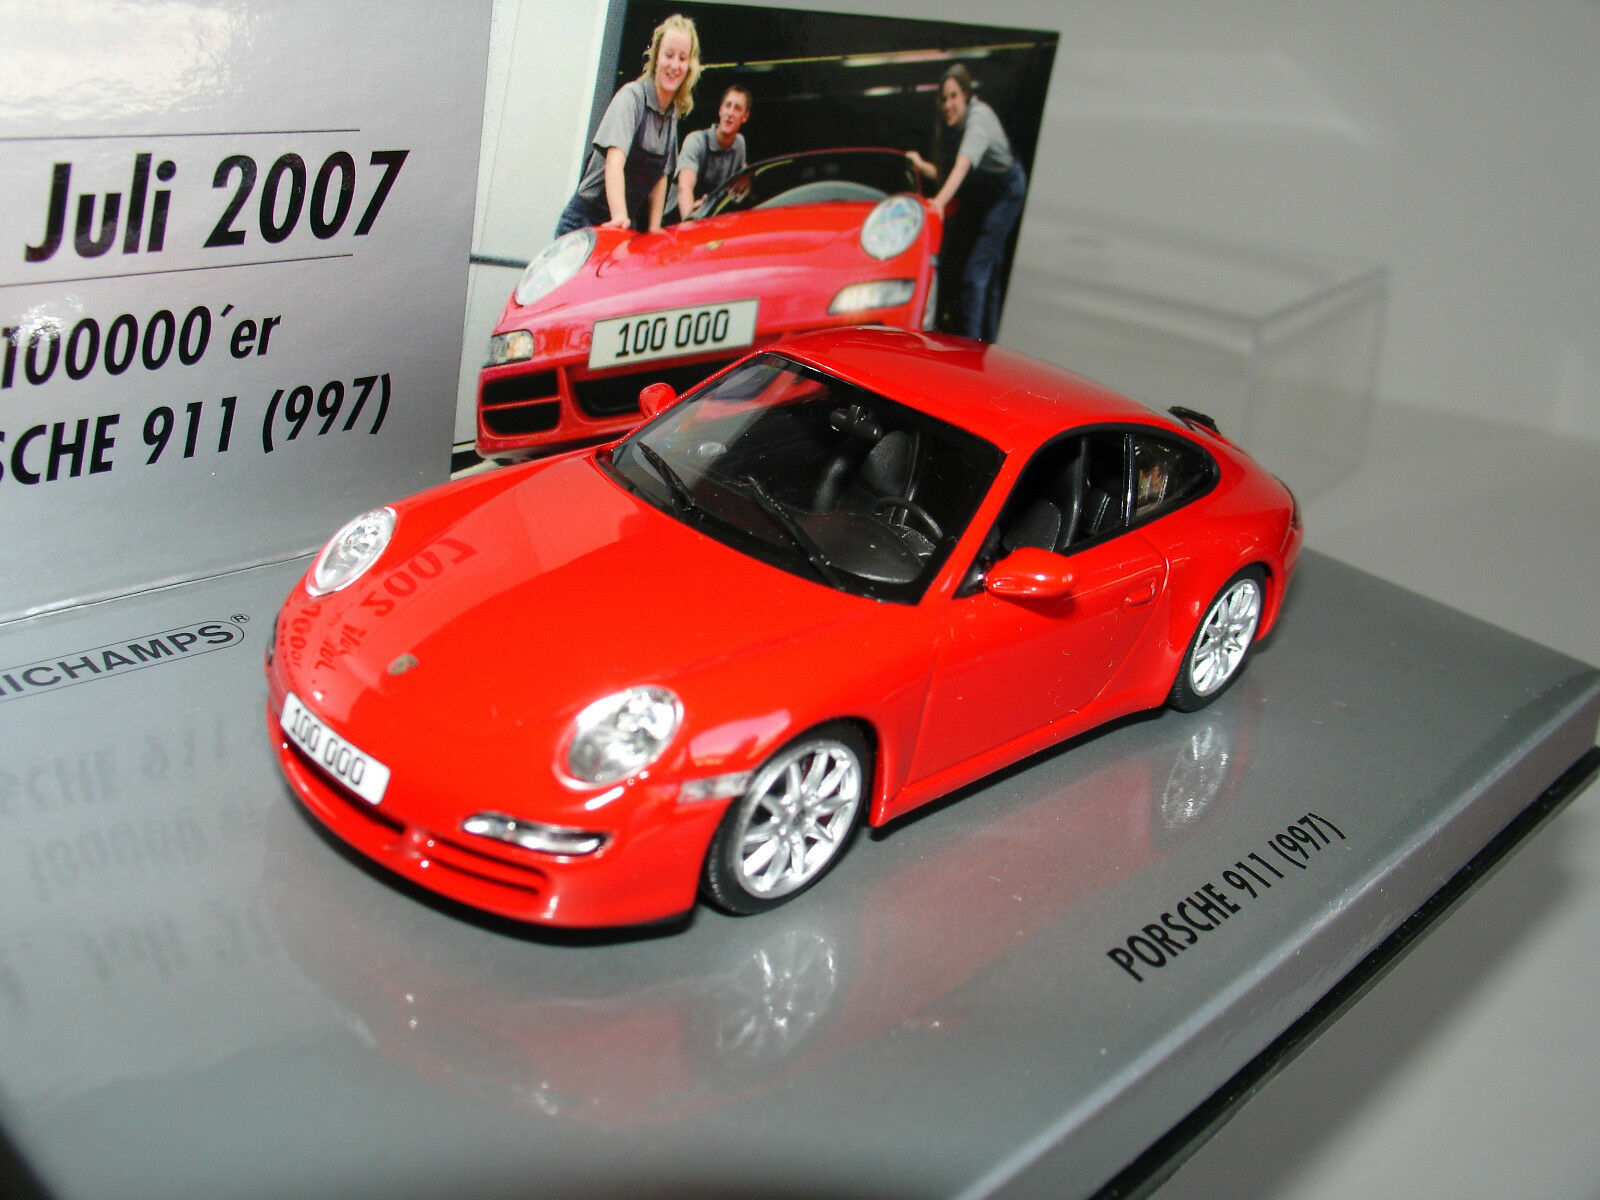 1 43 PORSCHE 911 (997) CARRERA S rot  100.000 th  by MINICHAMPS